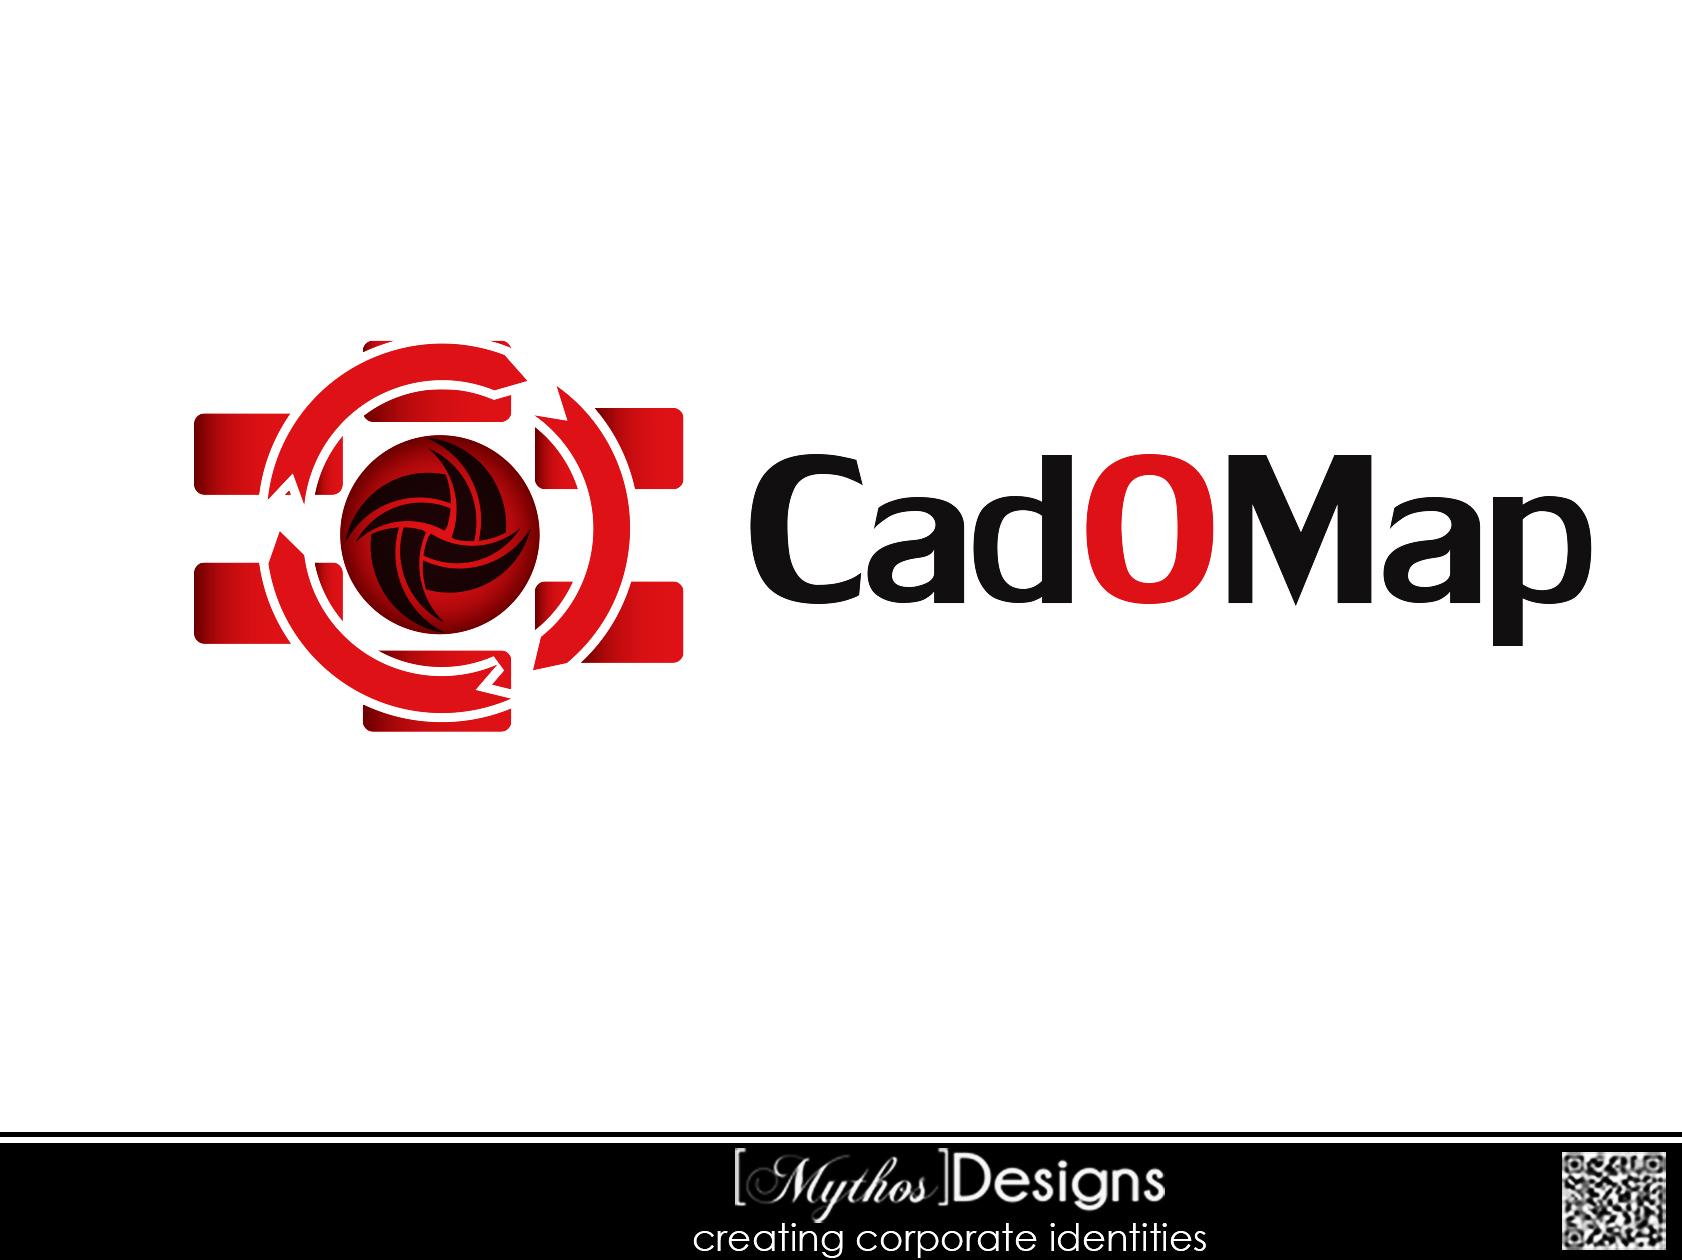 Logo Design by Mythos Designs - Entry No. 51 in the Logo Design Contest Captivating Logo Design for CadOMap software product.